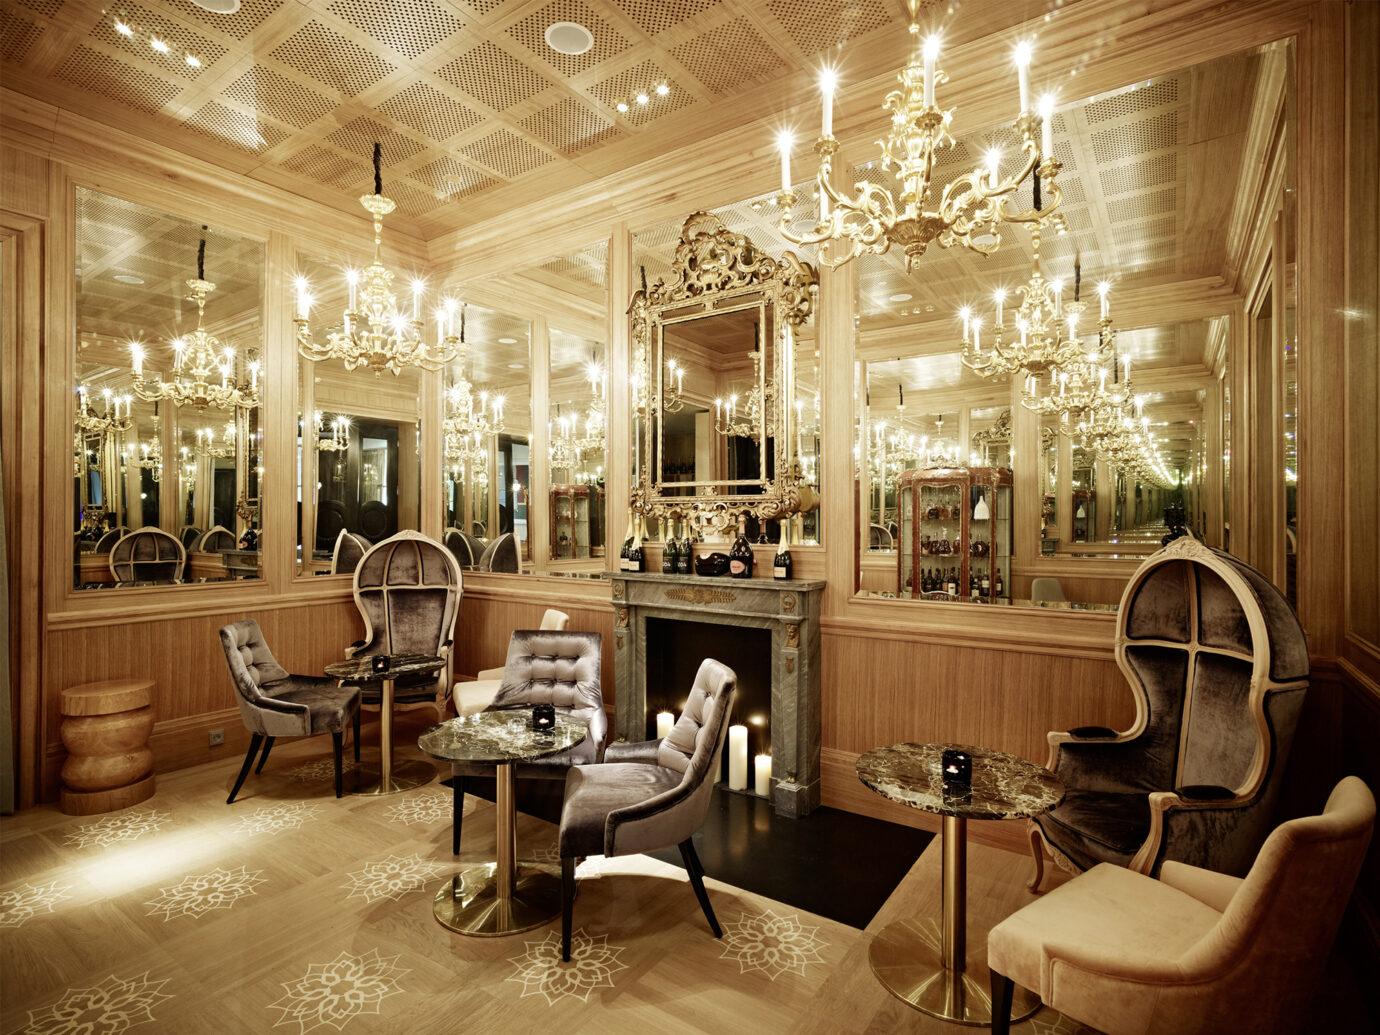 Bar at Hotel San Souci, Vienna, Austria